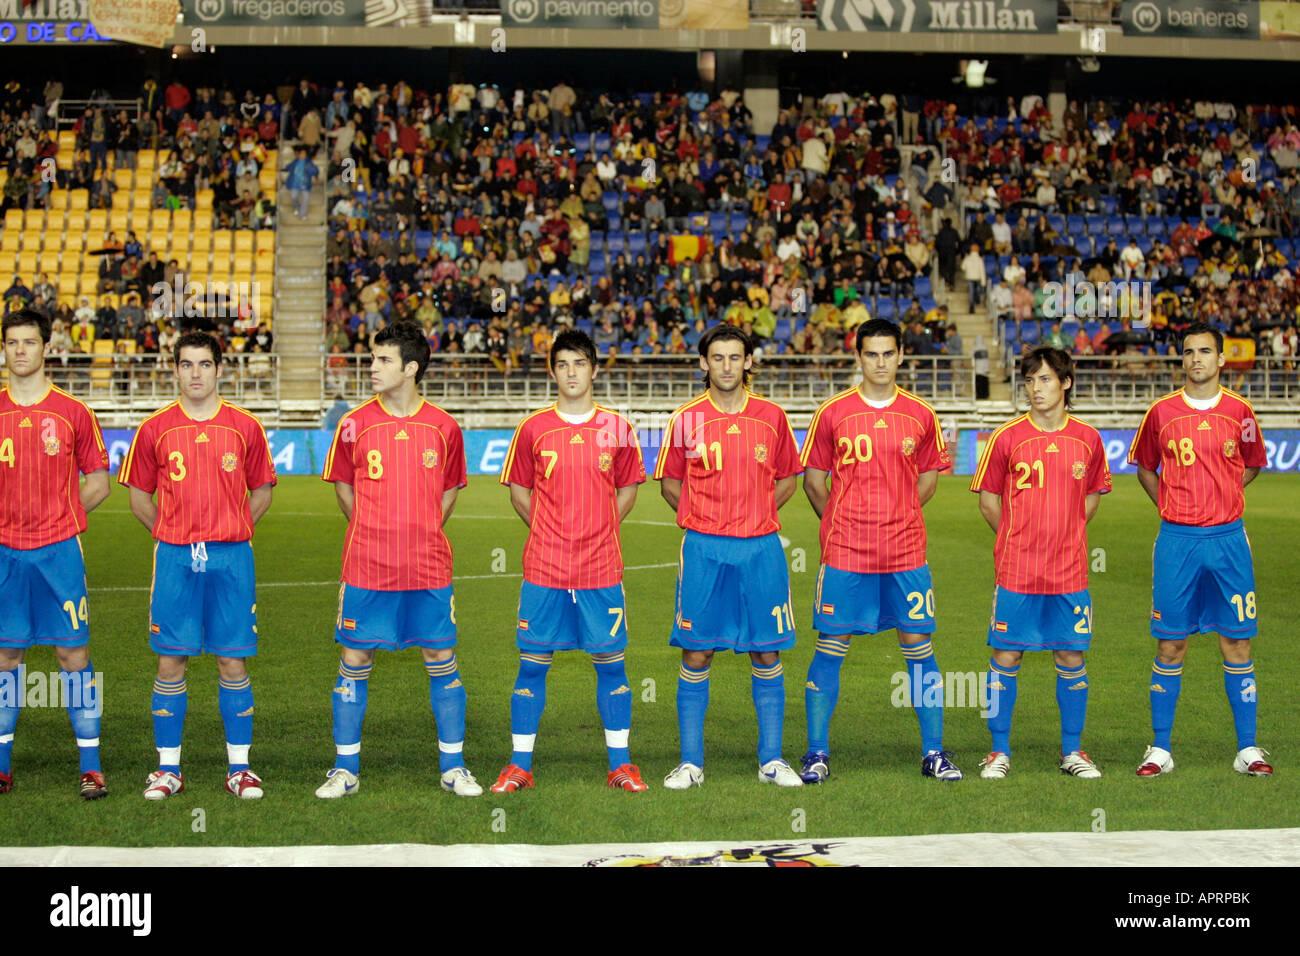 Hilo de la selección de España (selección española) The-spanish-squad-APRPBK